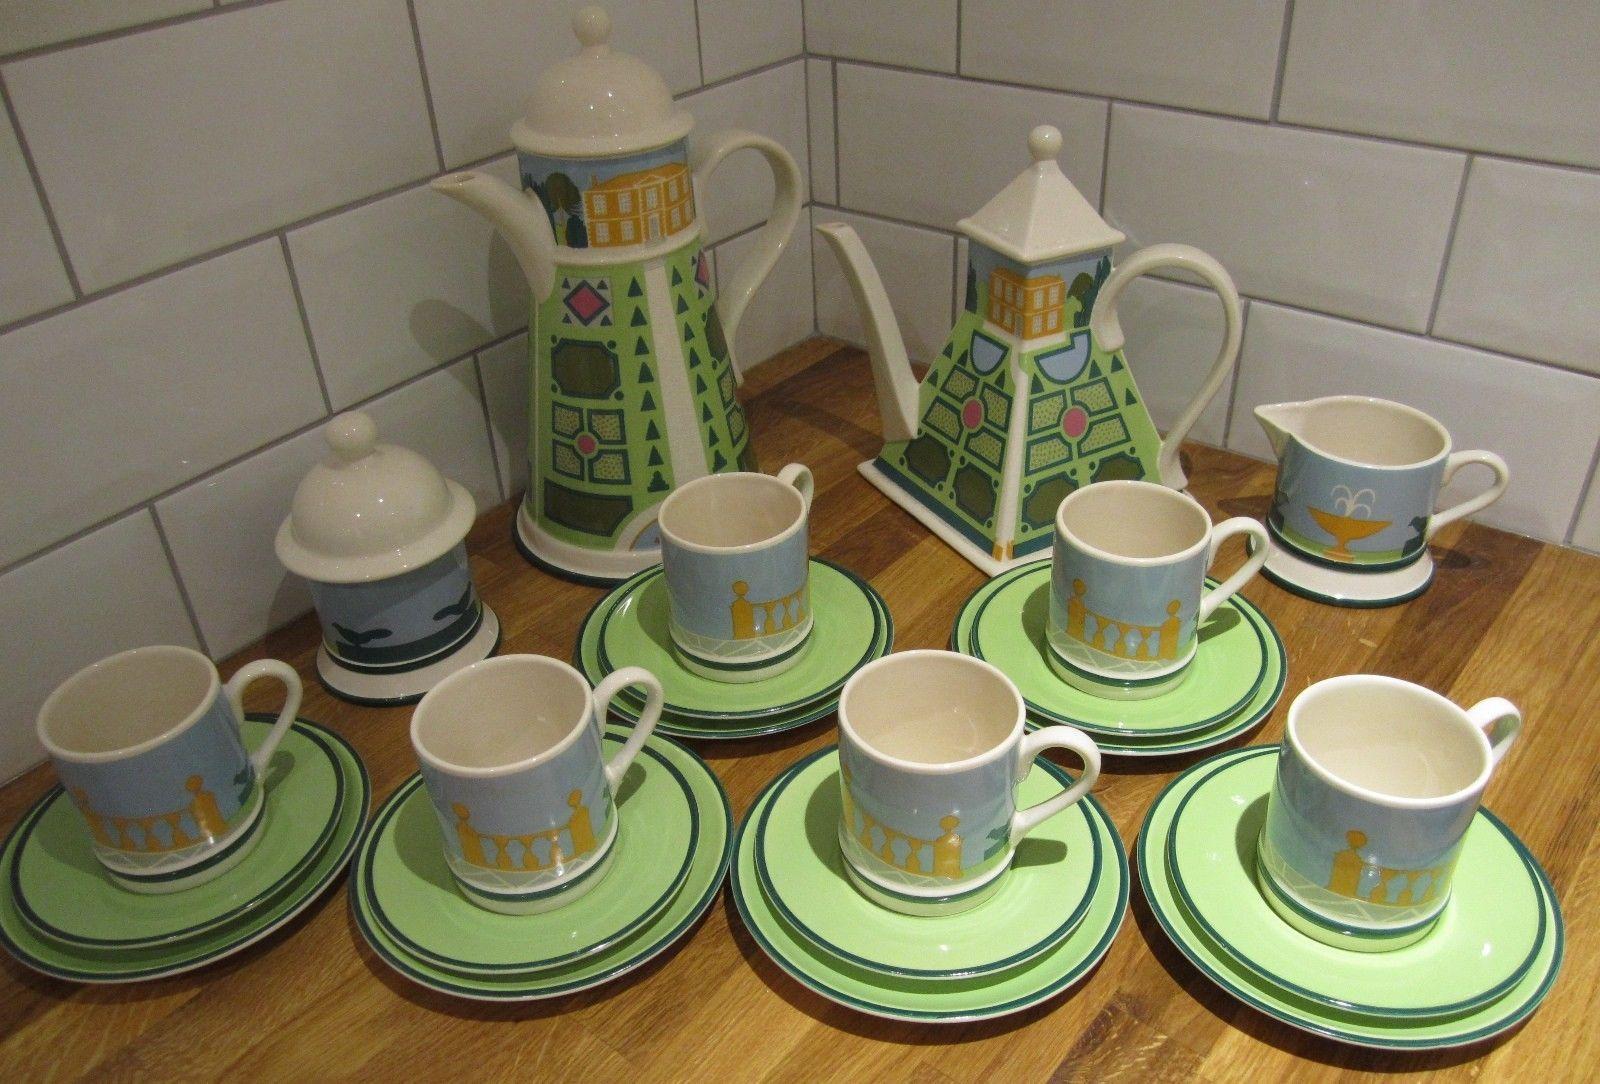 Carlton Ware Re 1978 22 Pcs Tea Coffee Set Roger Mic Danka Napiorkowska